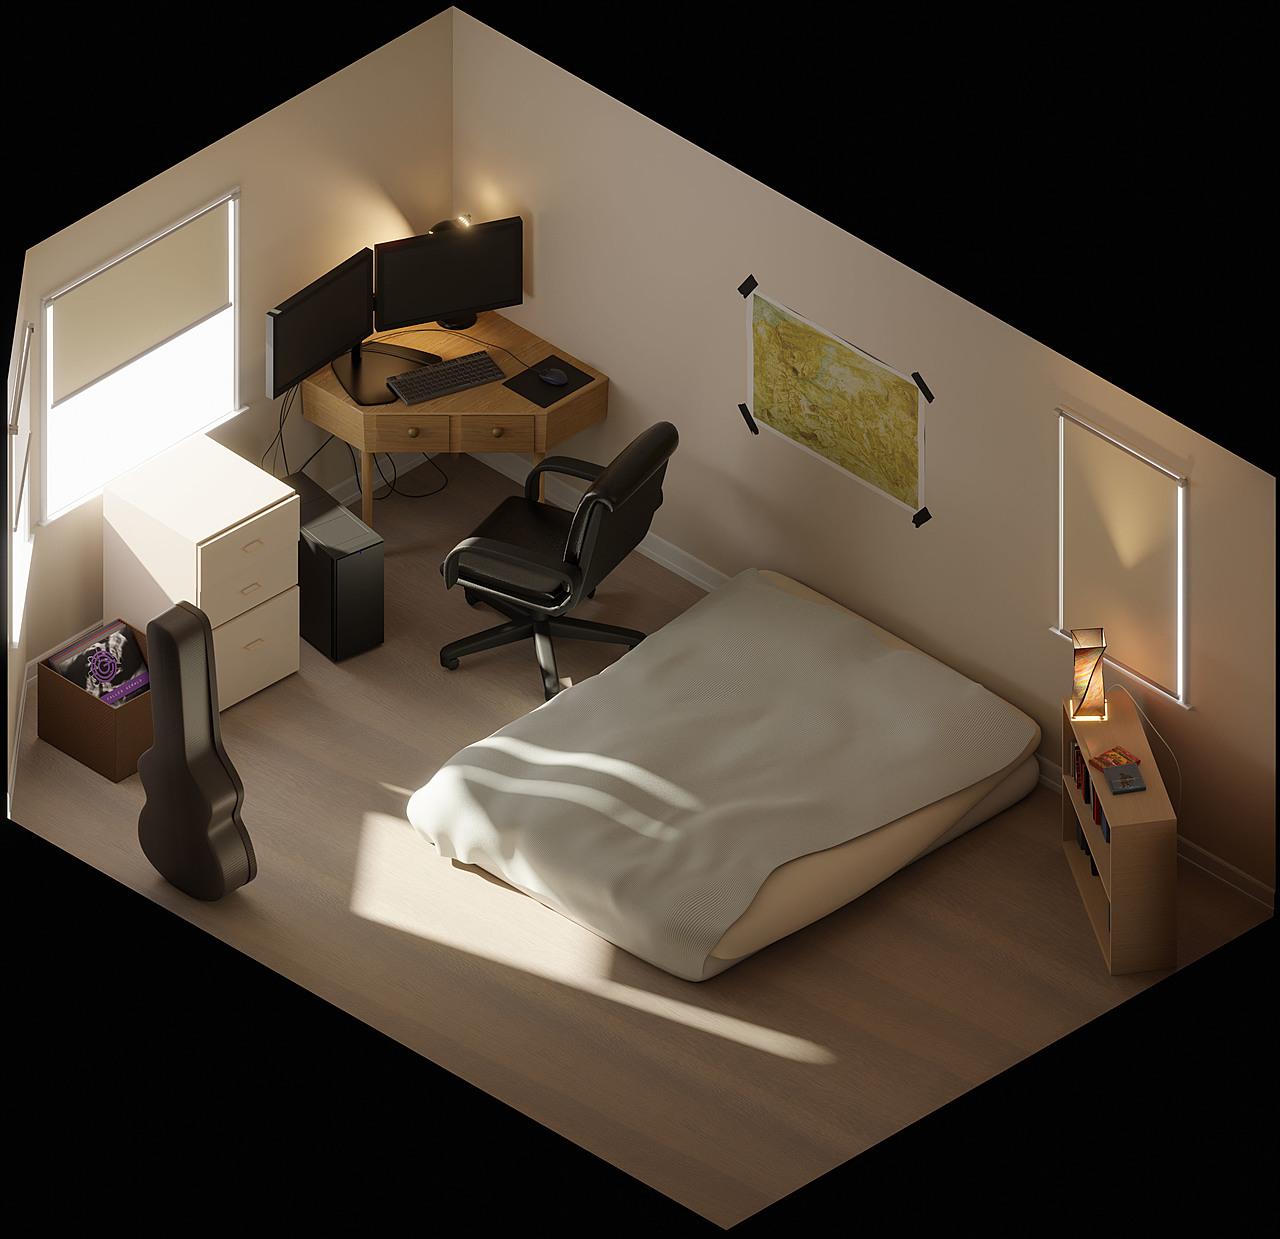 Something that Feels Like my Bedroom: the Haiku :P